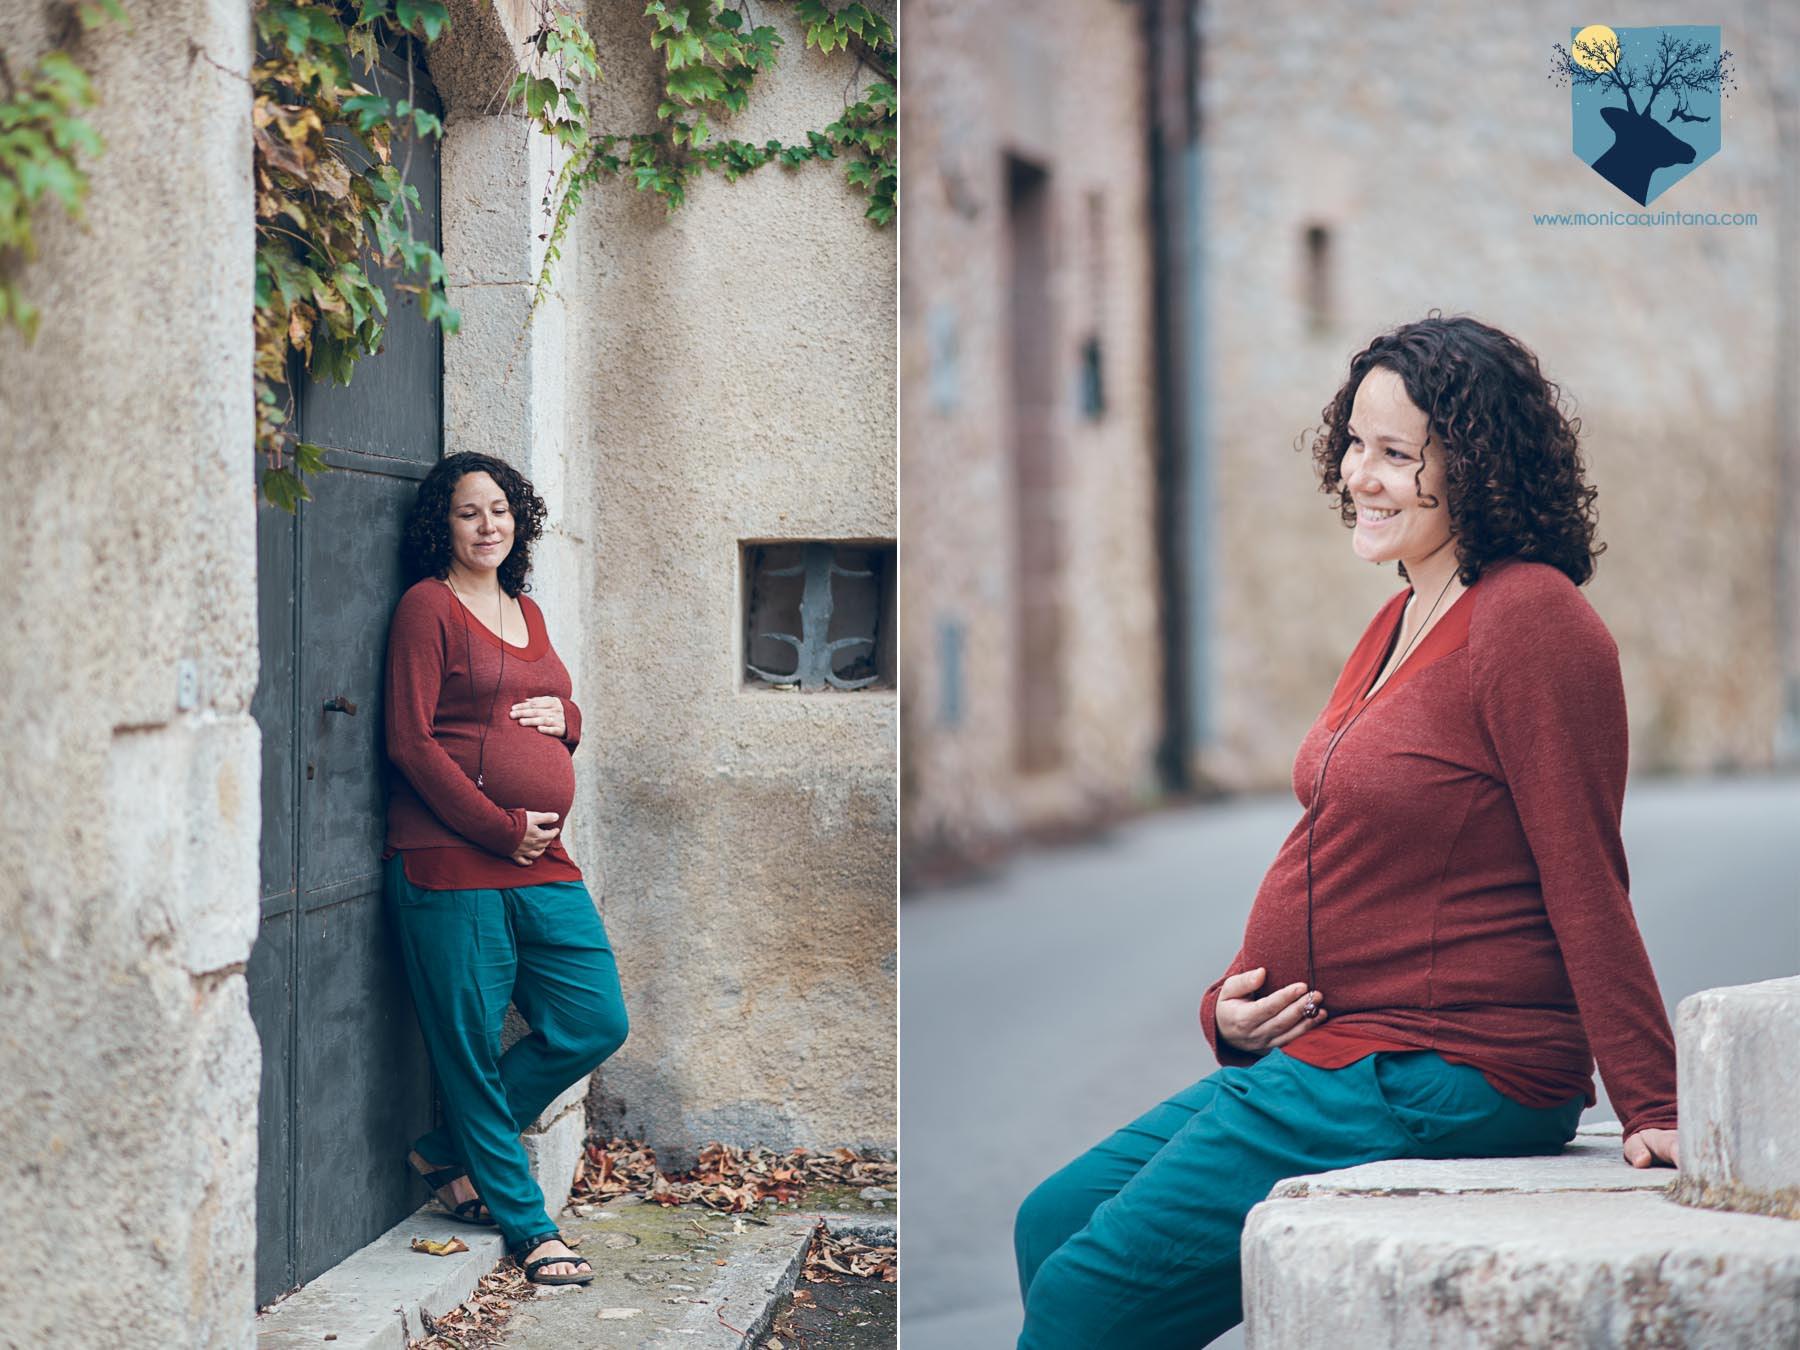 fotografia, girona, figueres, emporda, monica, quintana, familia, retrato, embarazo, embarazada, pareja, amor, naturaleza, embaras, natura, parella, fotos